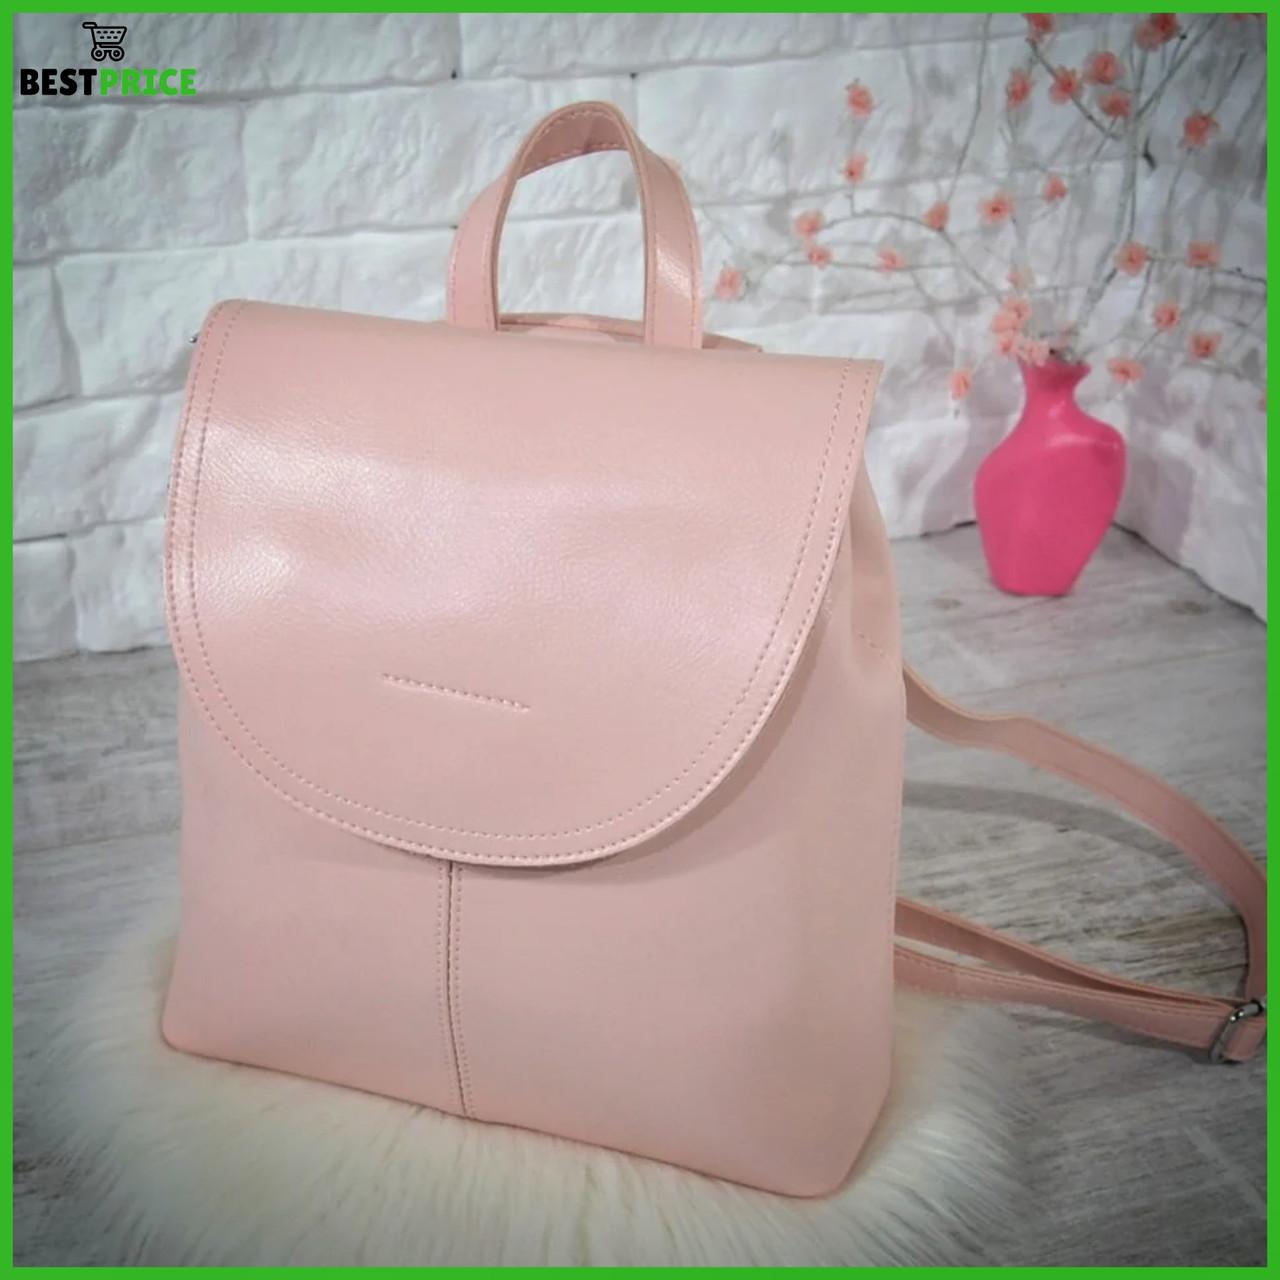 Женский рюкзак-сумочка Star .Пудровый (пудра)